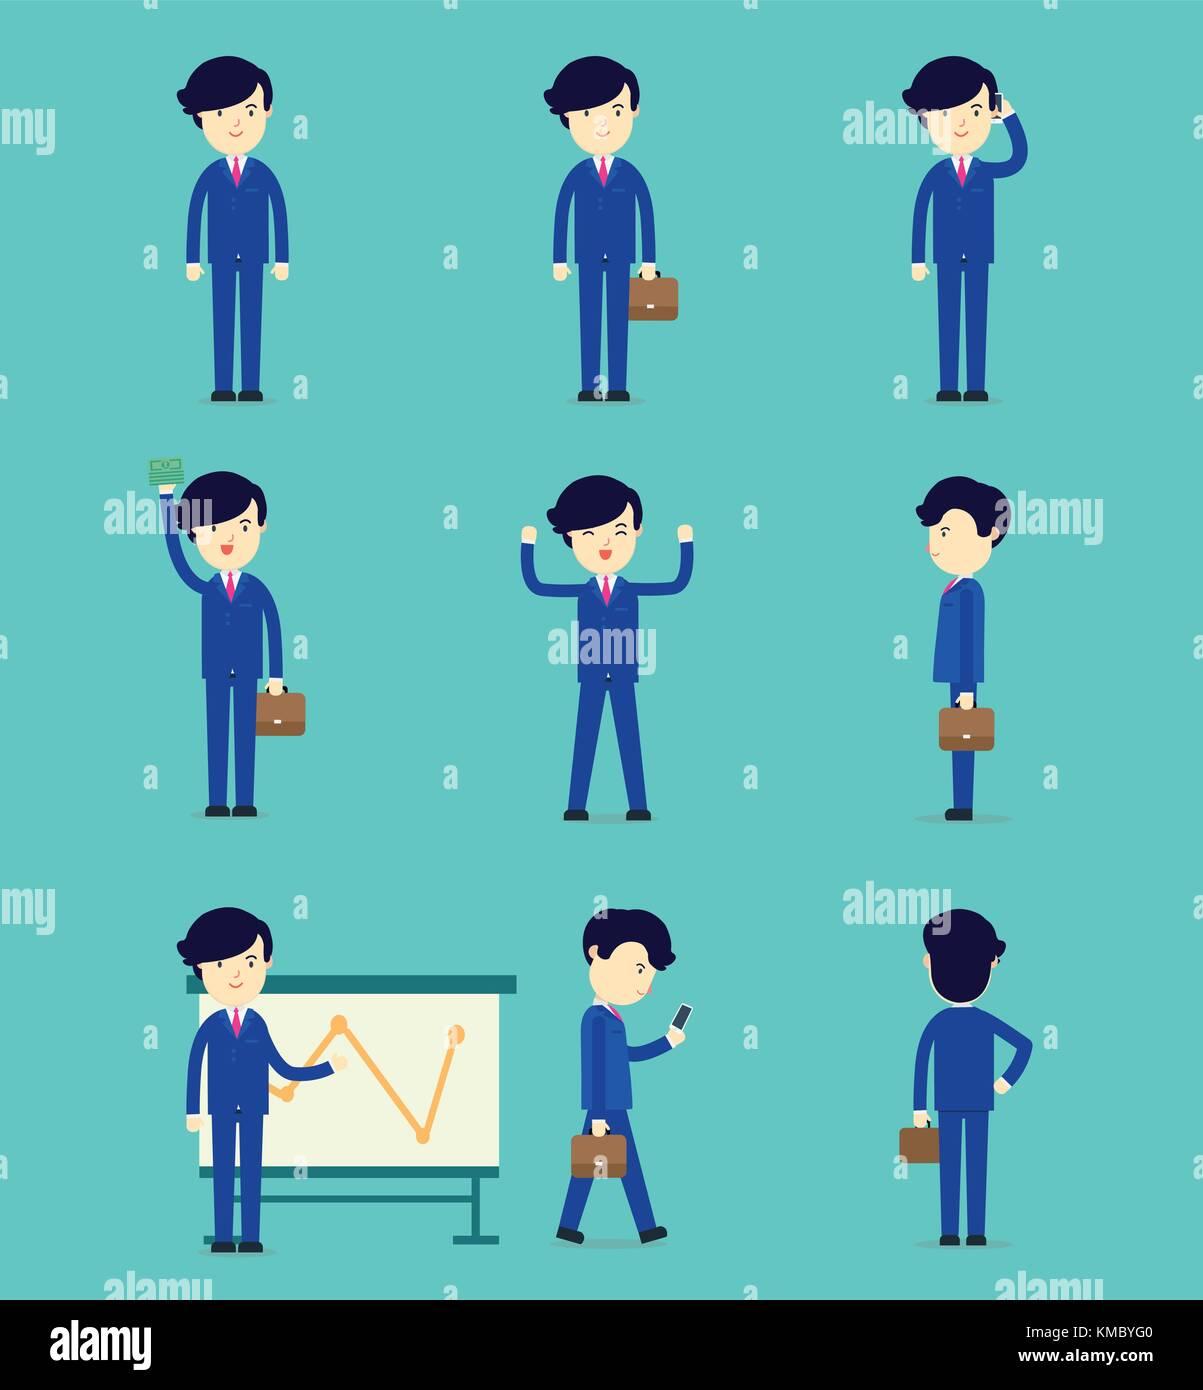 Cartoonsmart Character Design : Business man character in office stock photos